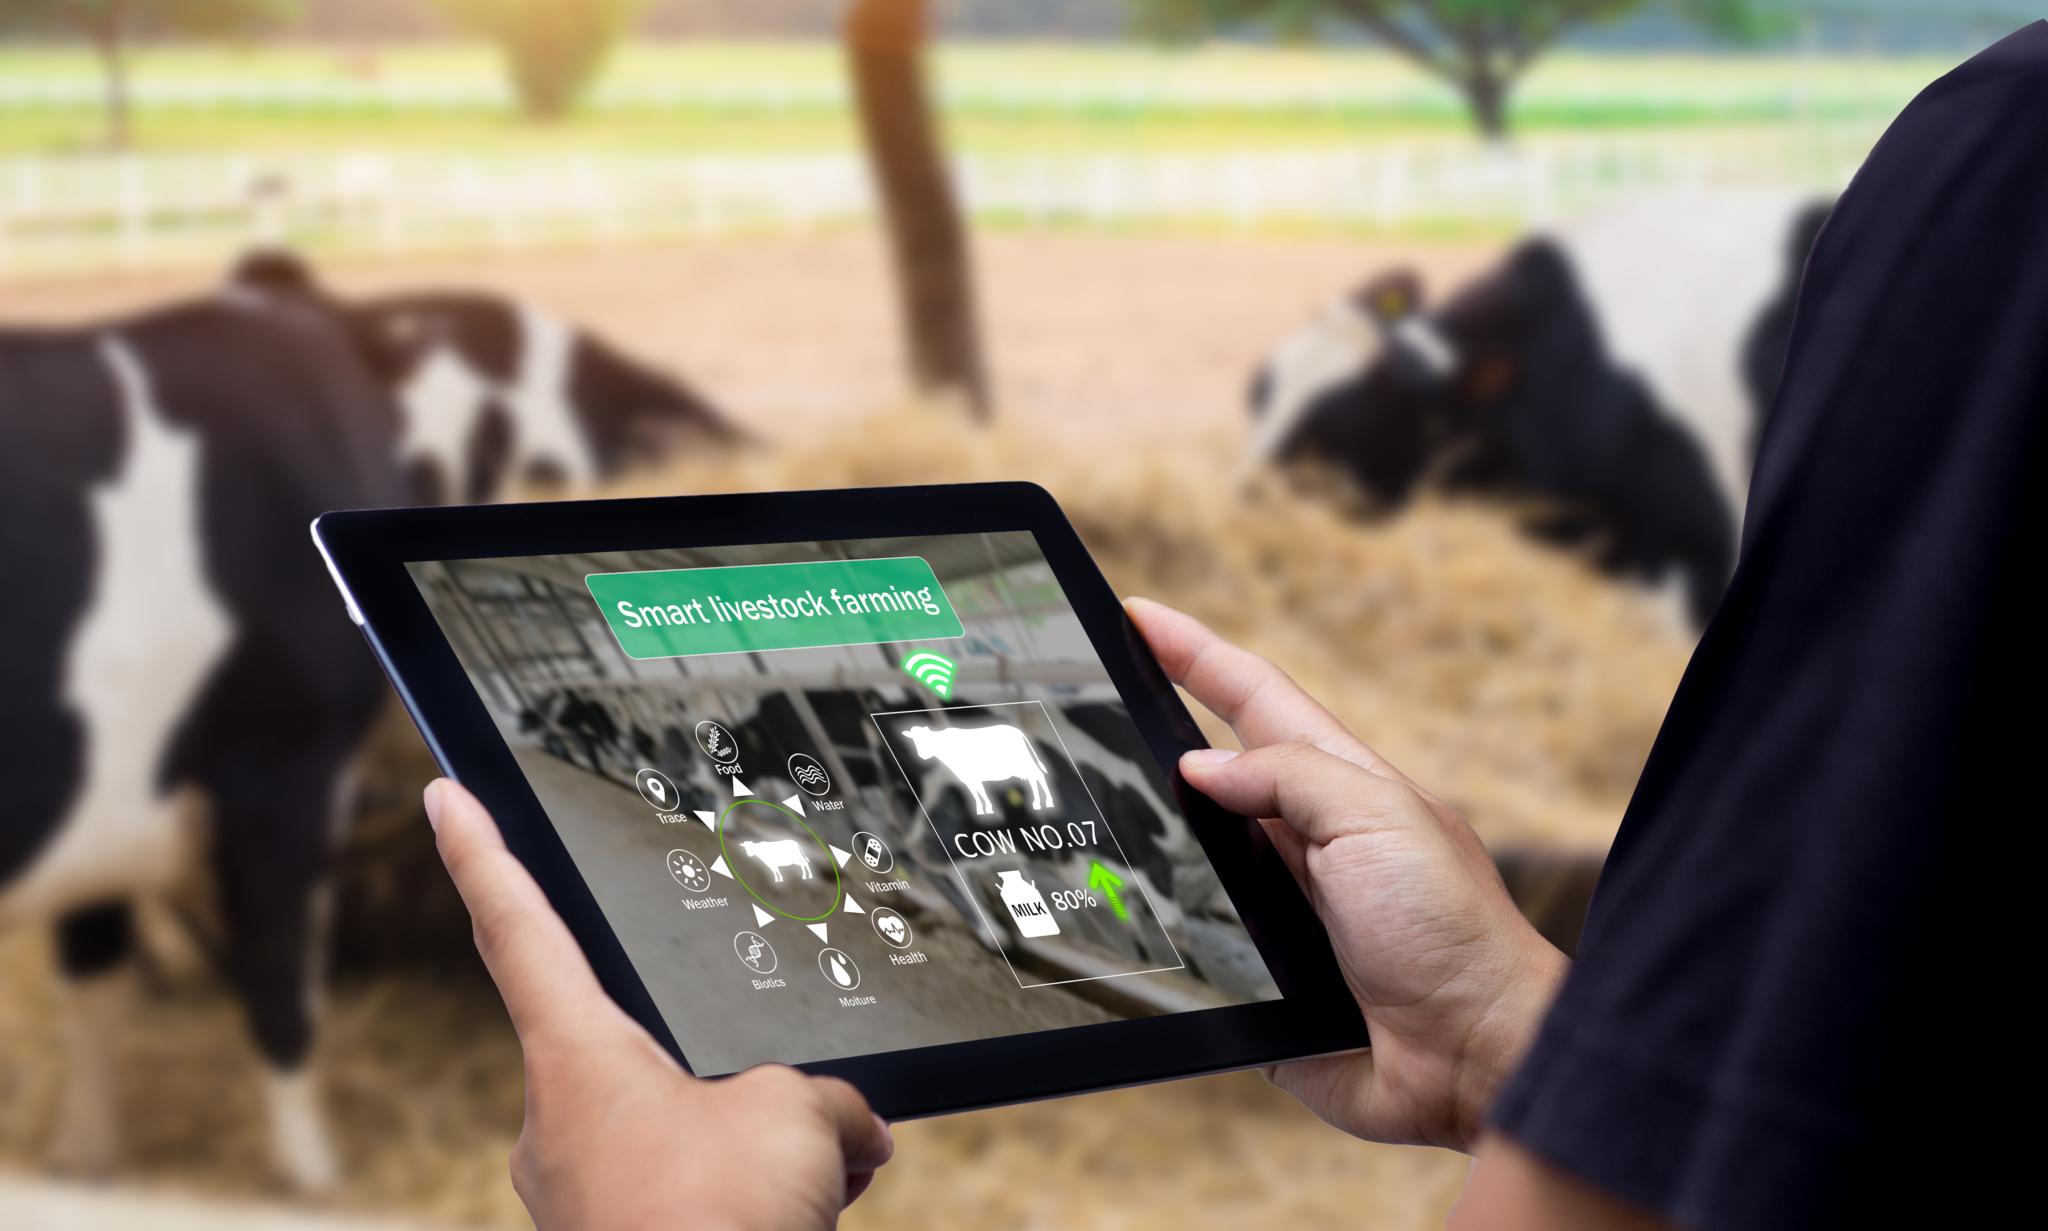 Smart Agri-tech livestock farming